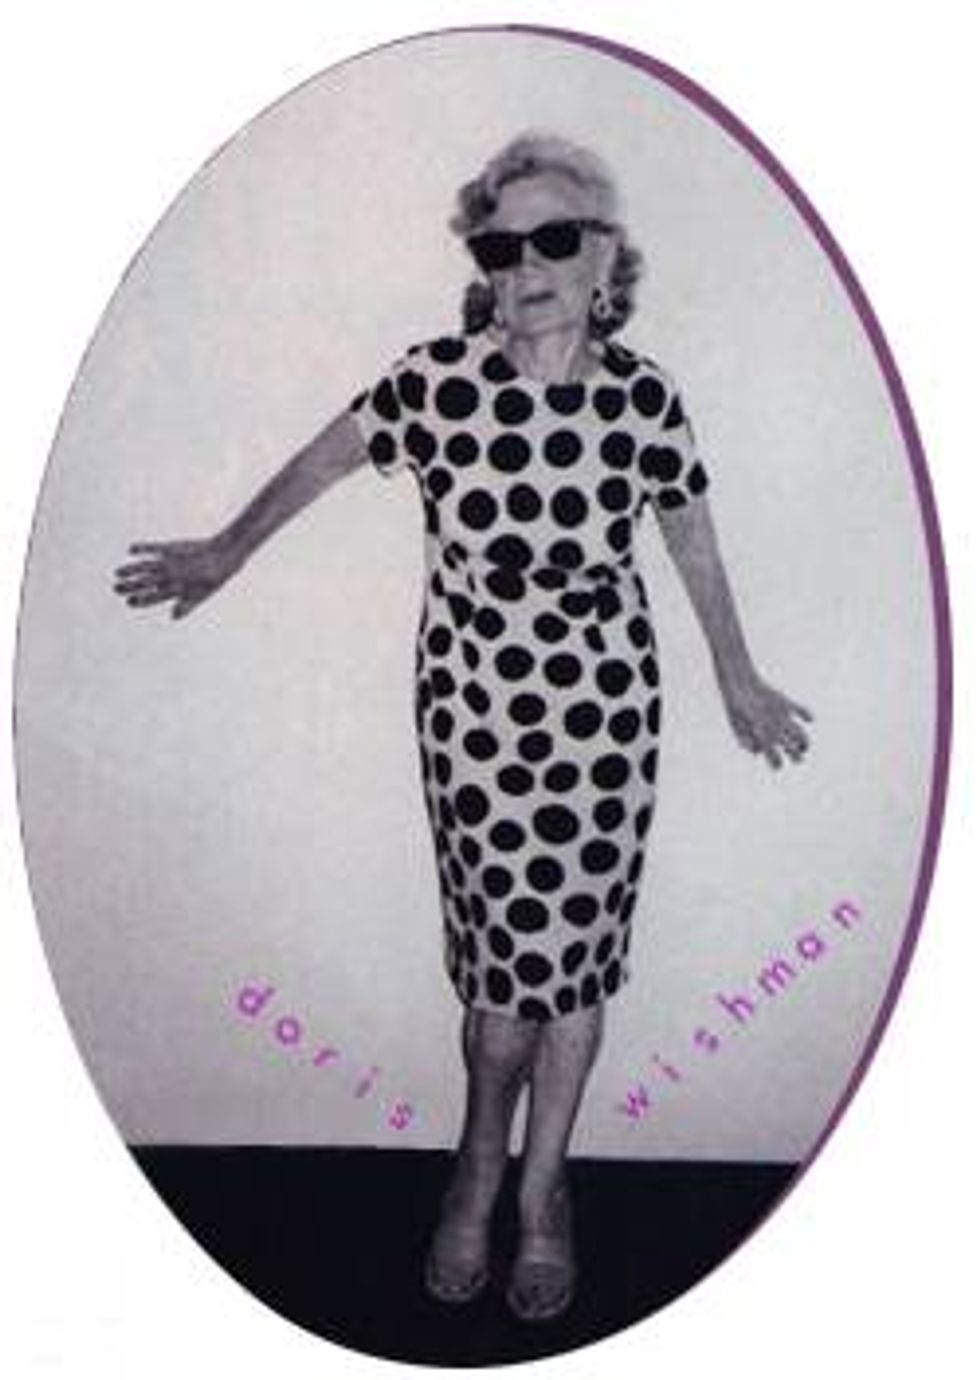 The mother of exploitation: Doris Wishman